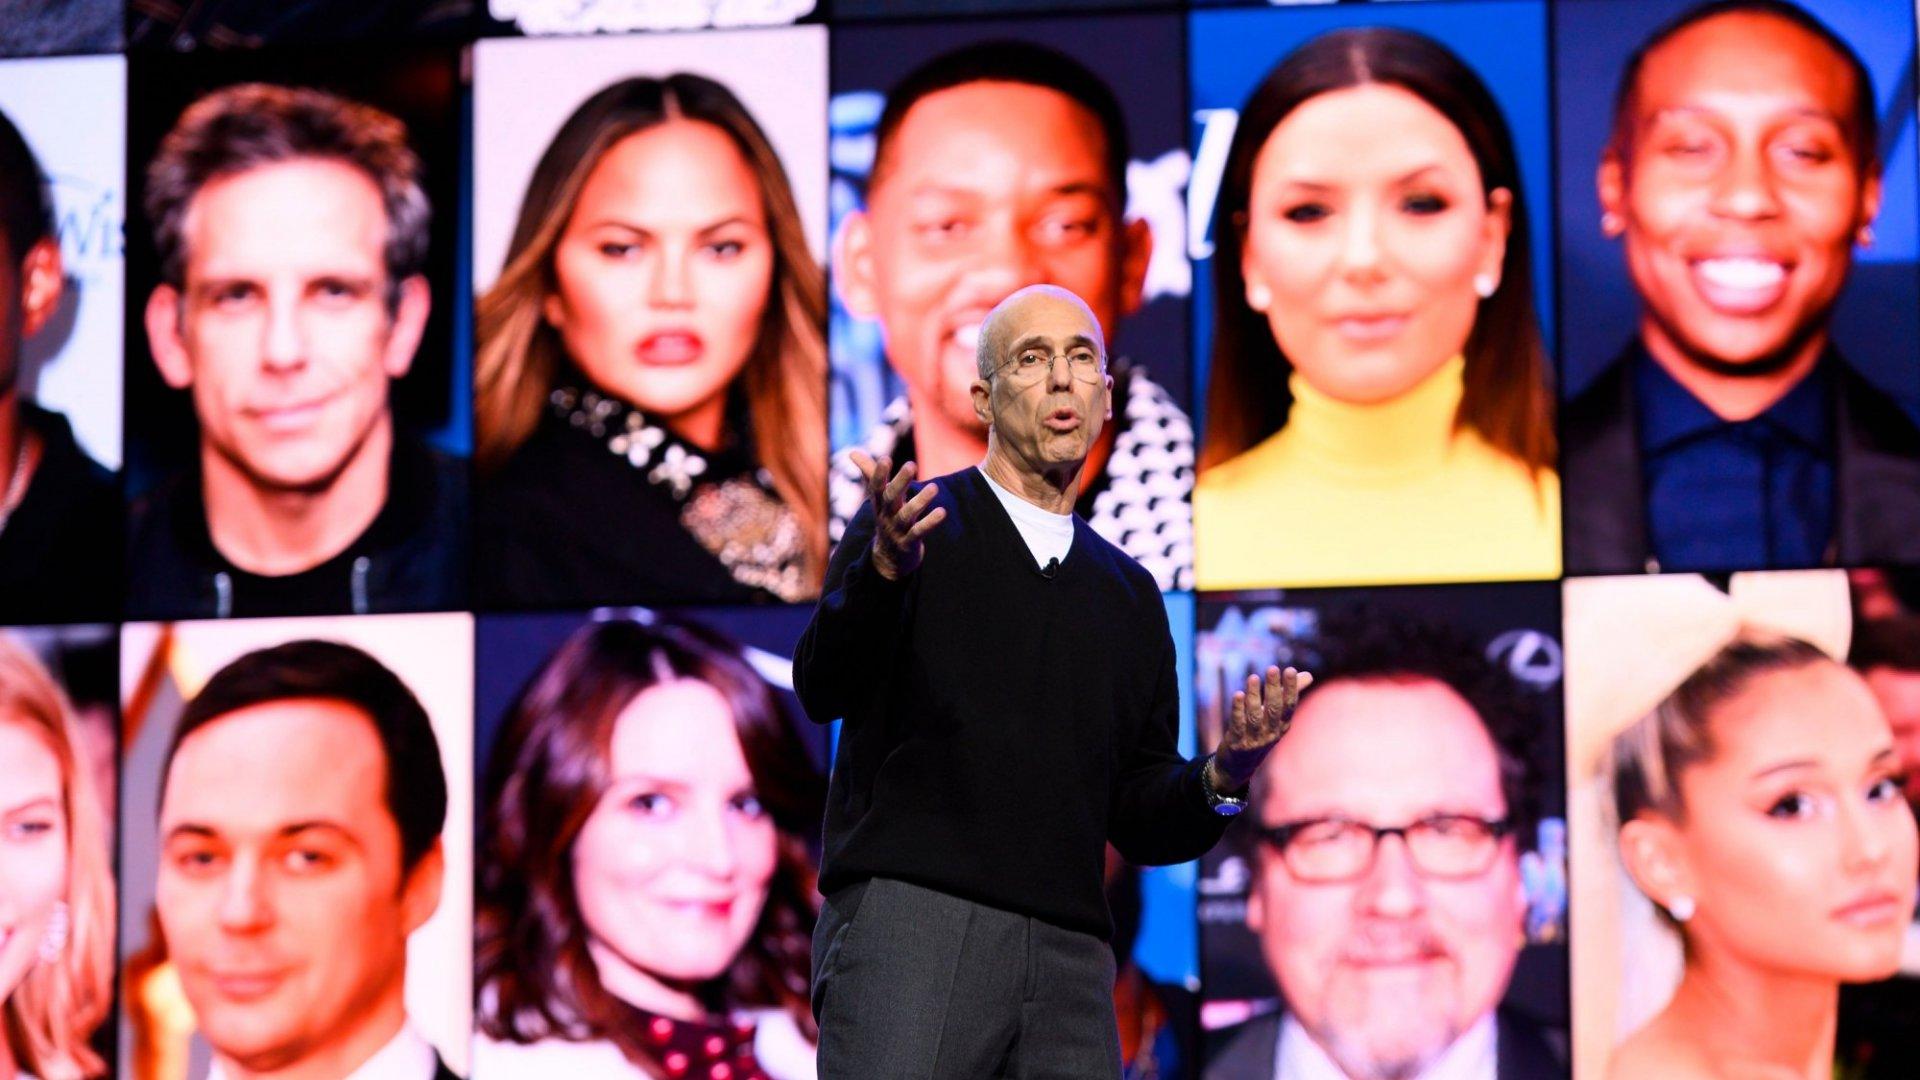 Jeffrey Katzenberg onstage at CES 2020.